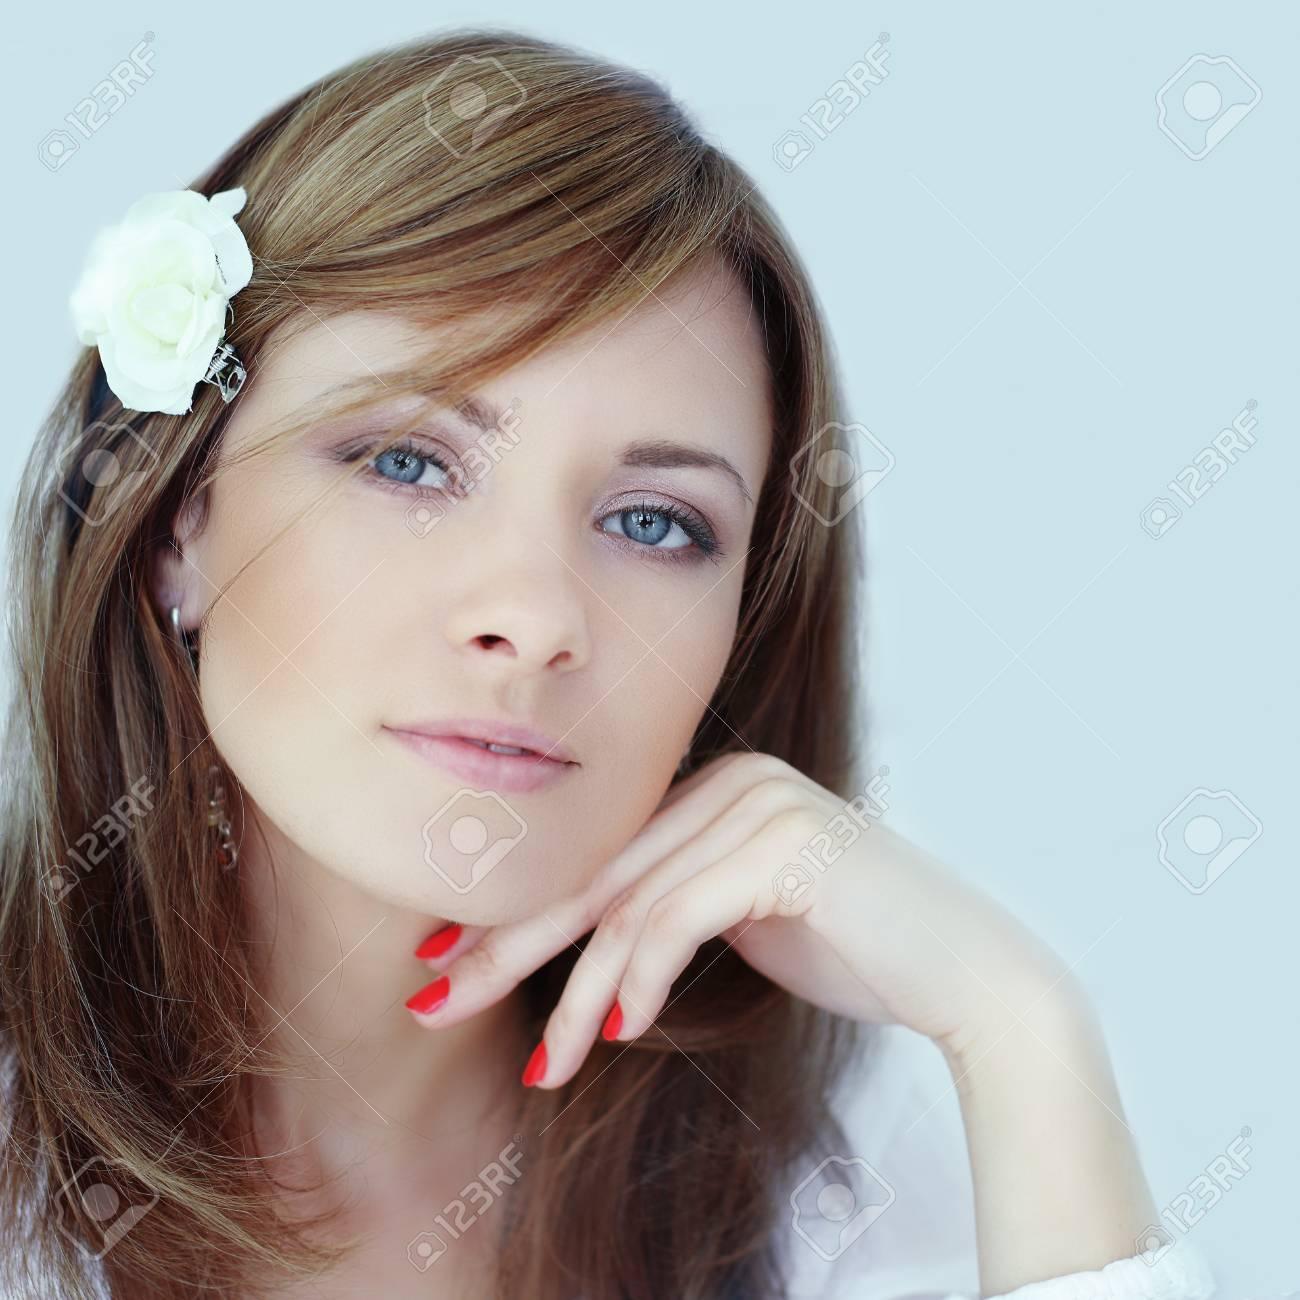 Perfektes Mädchen Bild Dreifache Blowjob-Videos